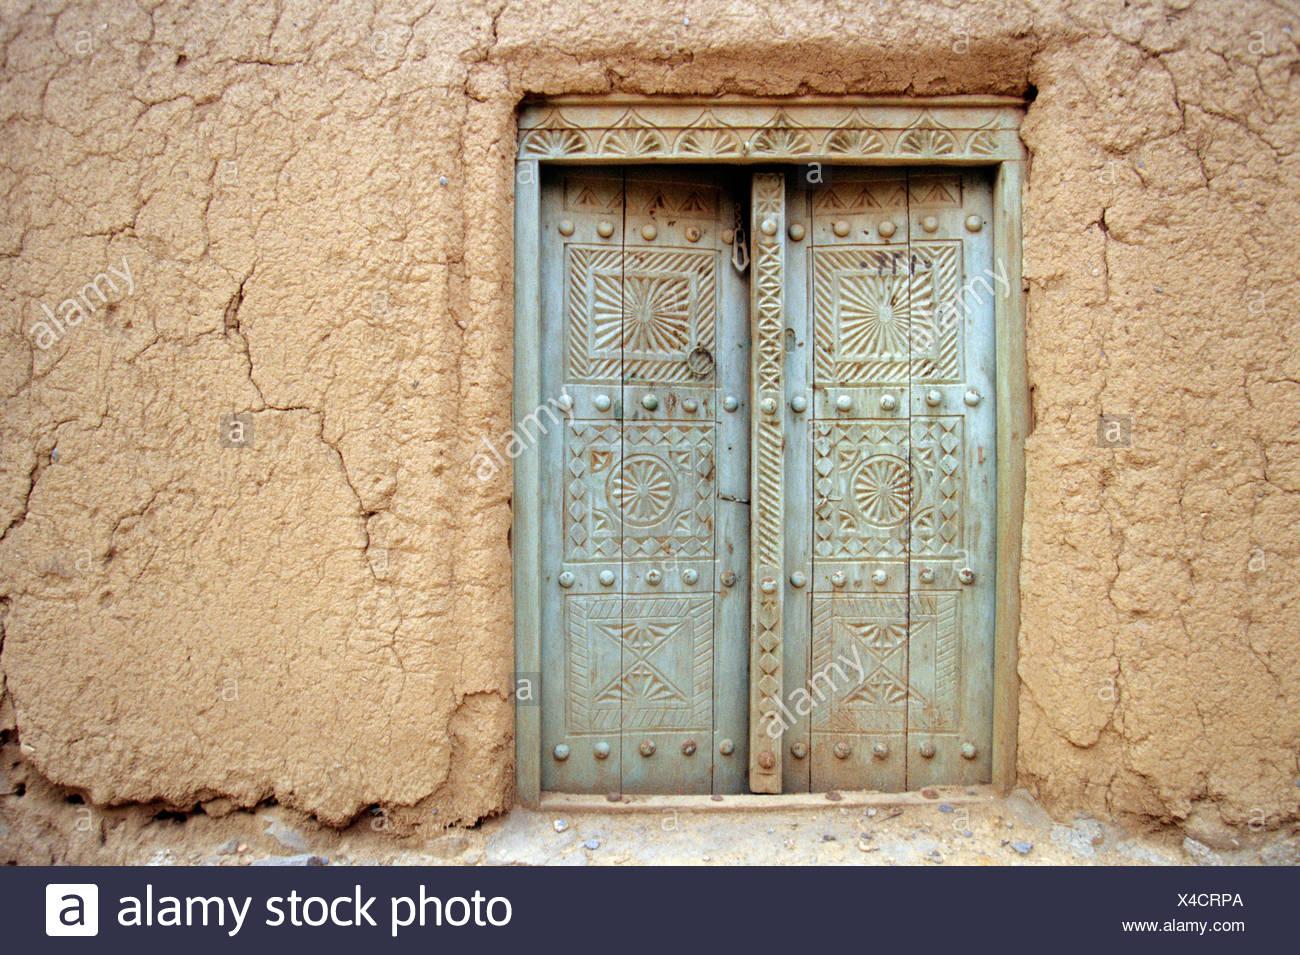 Old door in an earth house, adobe, in Al Hamra, Oman, Arabian Peninsula, Middle East - Stock Image